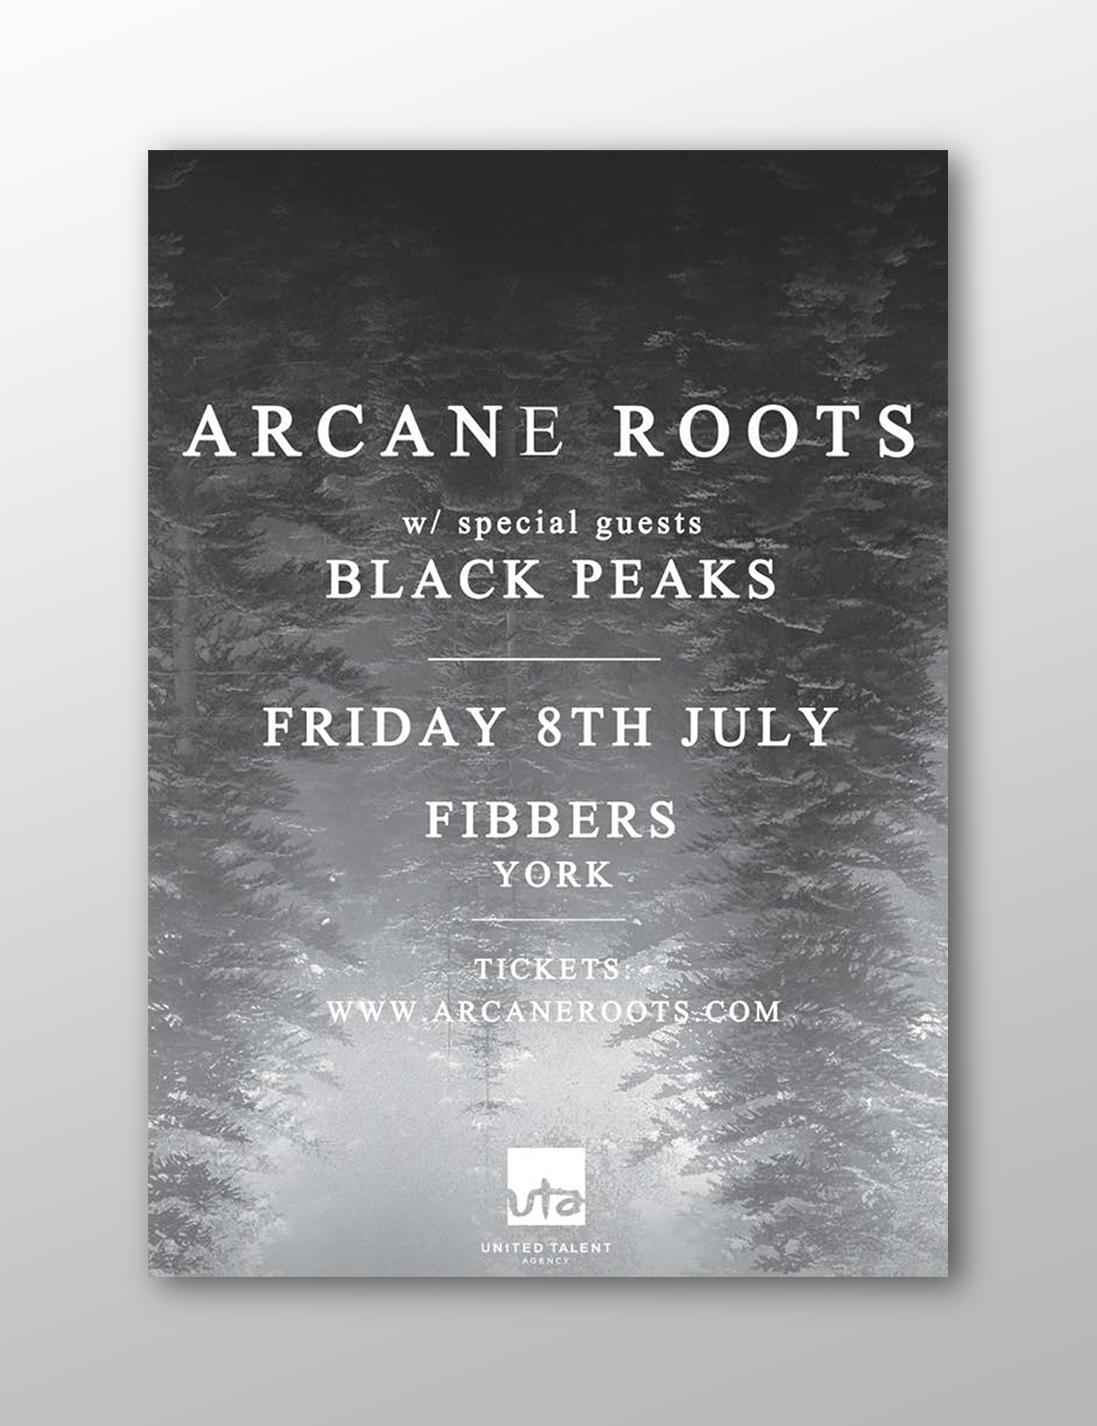 ARCANE ROOTS X BLACK PEAKS JULY 2016